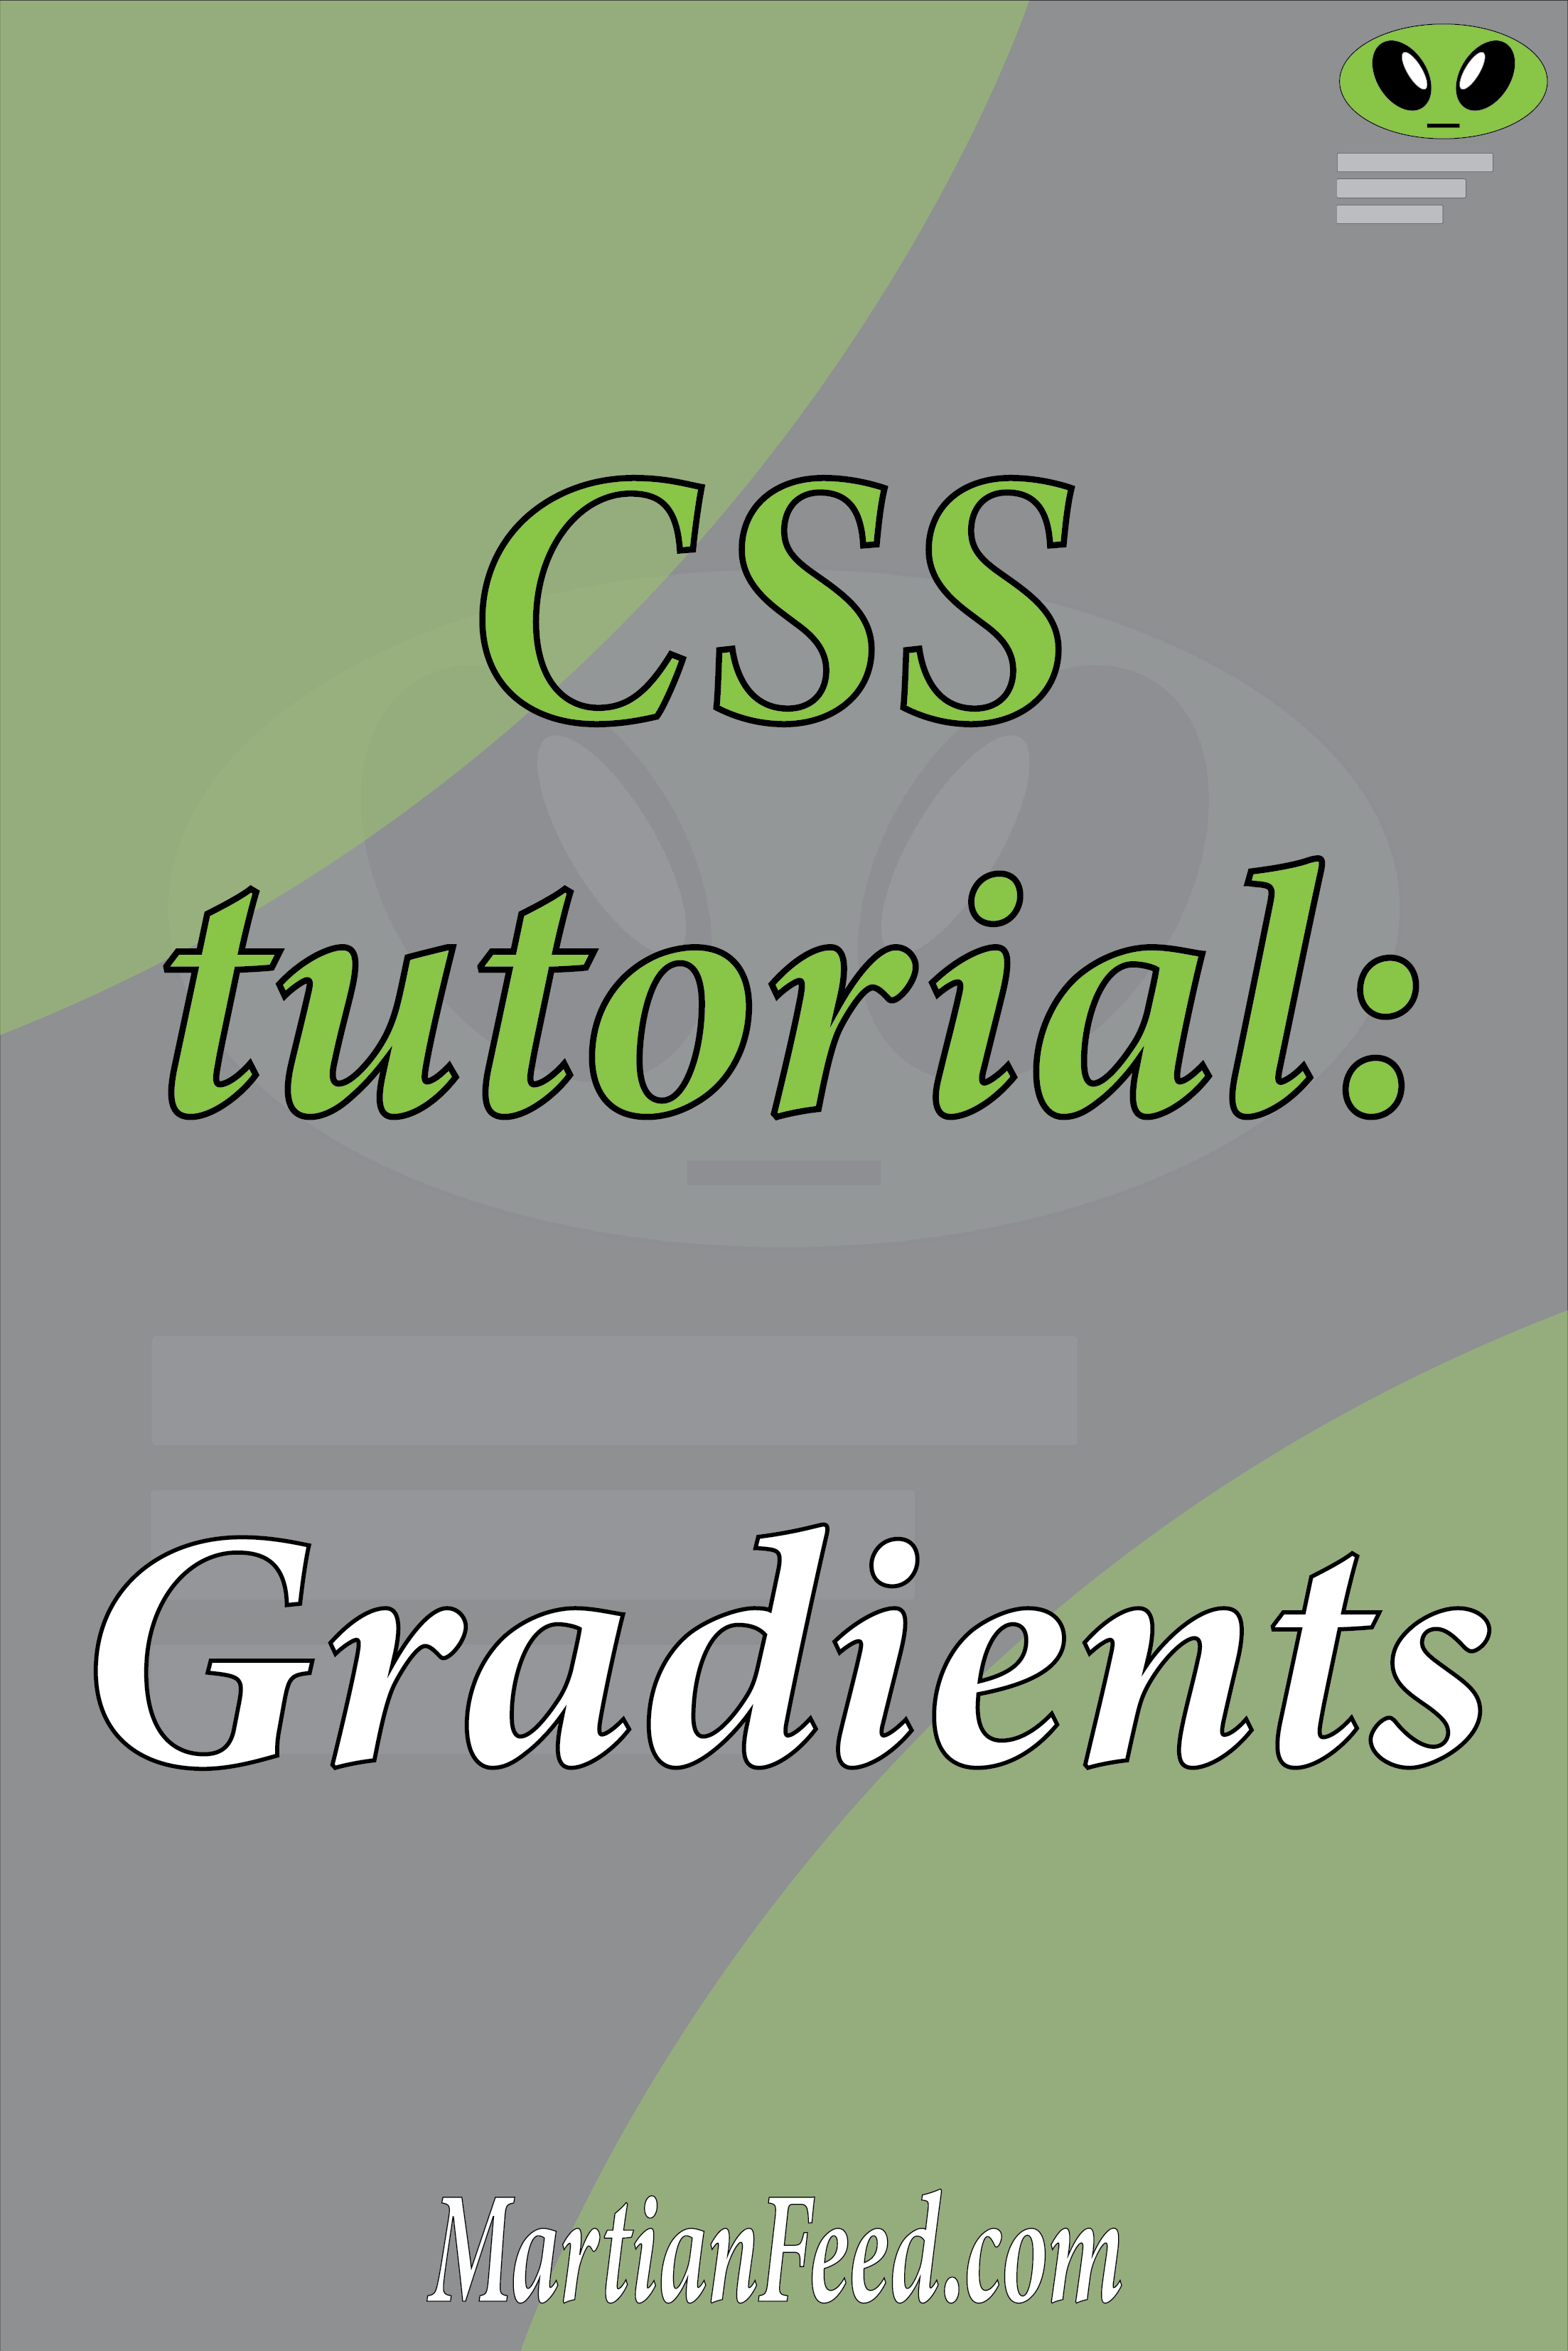 CSS Gradients Css tutorial, Css